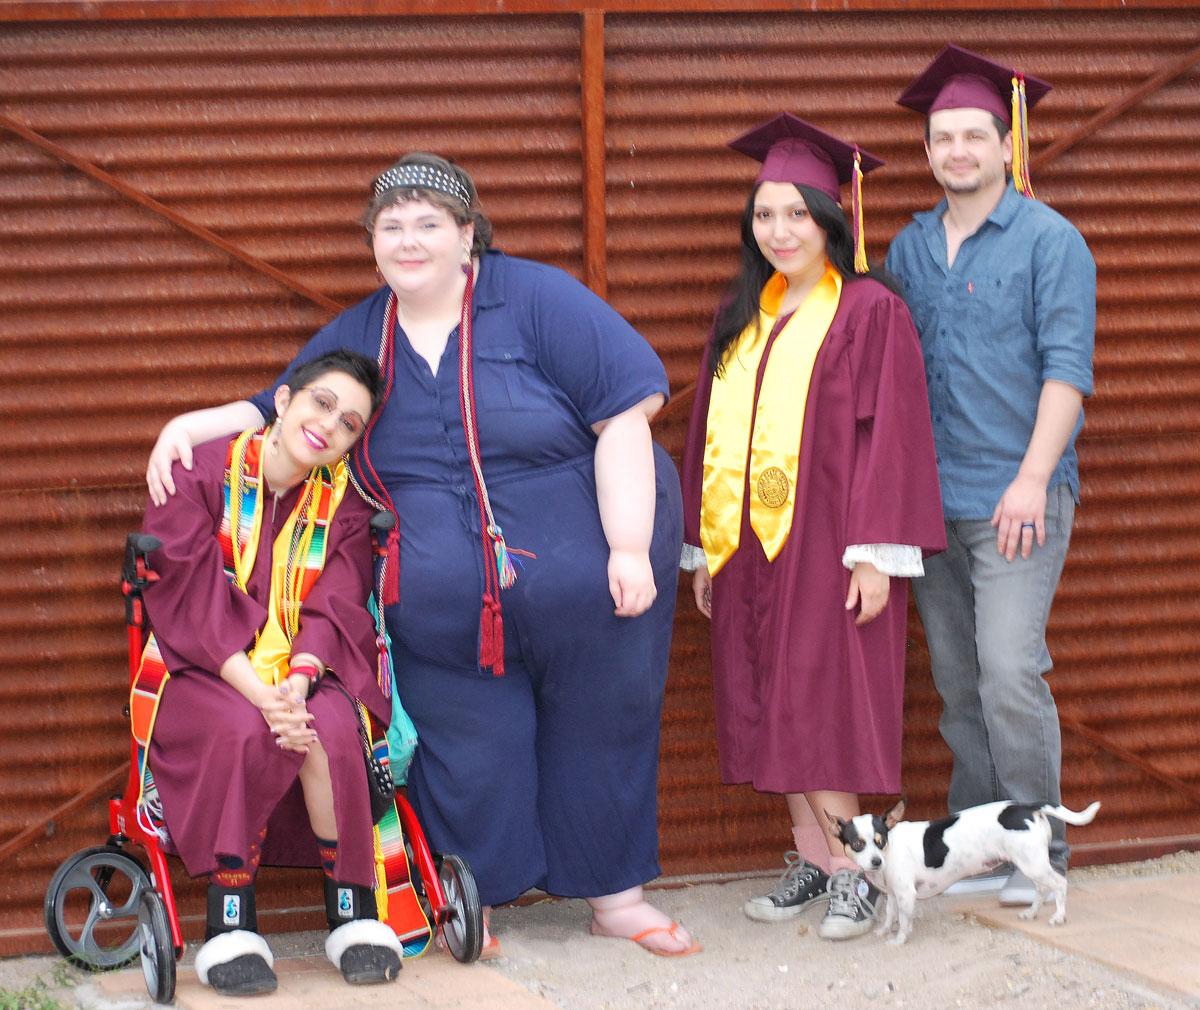 Nicole Haikalis, Sarah Davis, Analisa Benites and Lydan McLaws pose for a graduation photo.